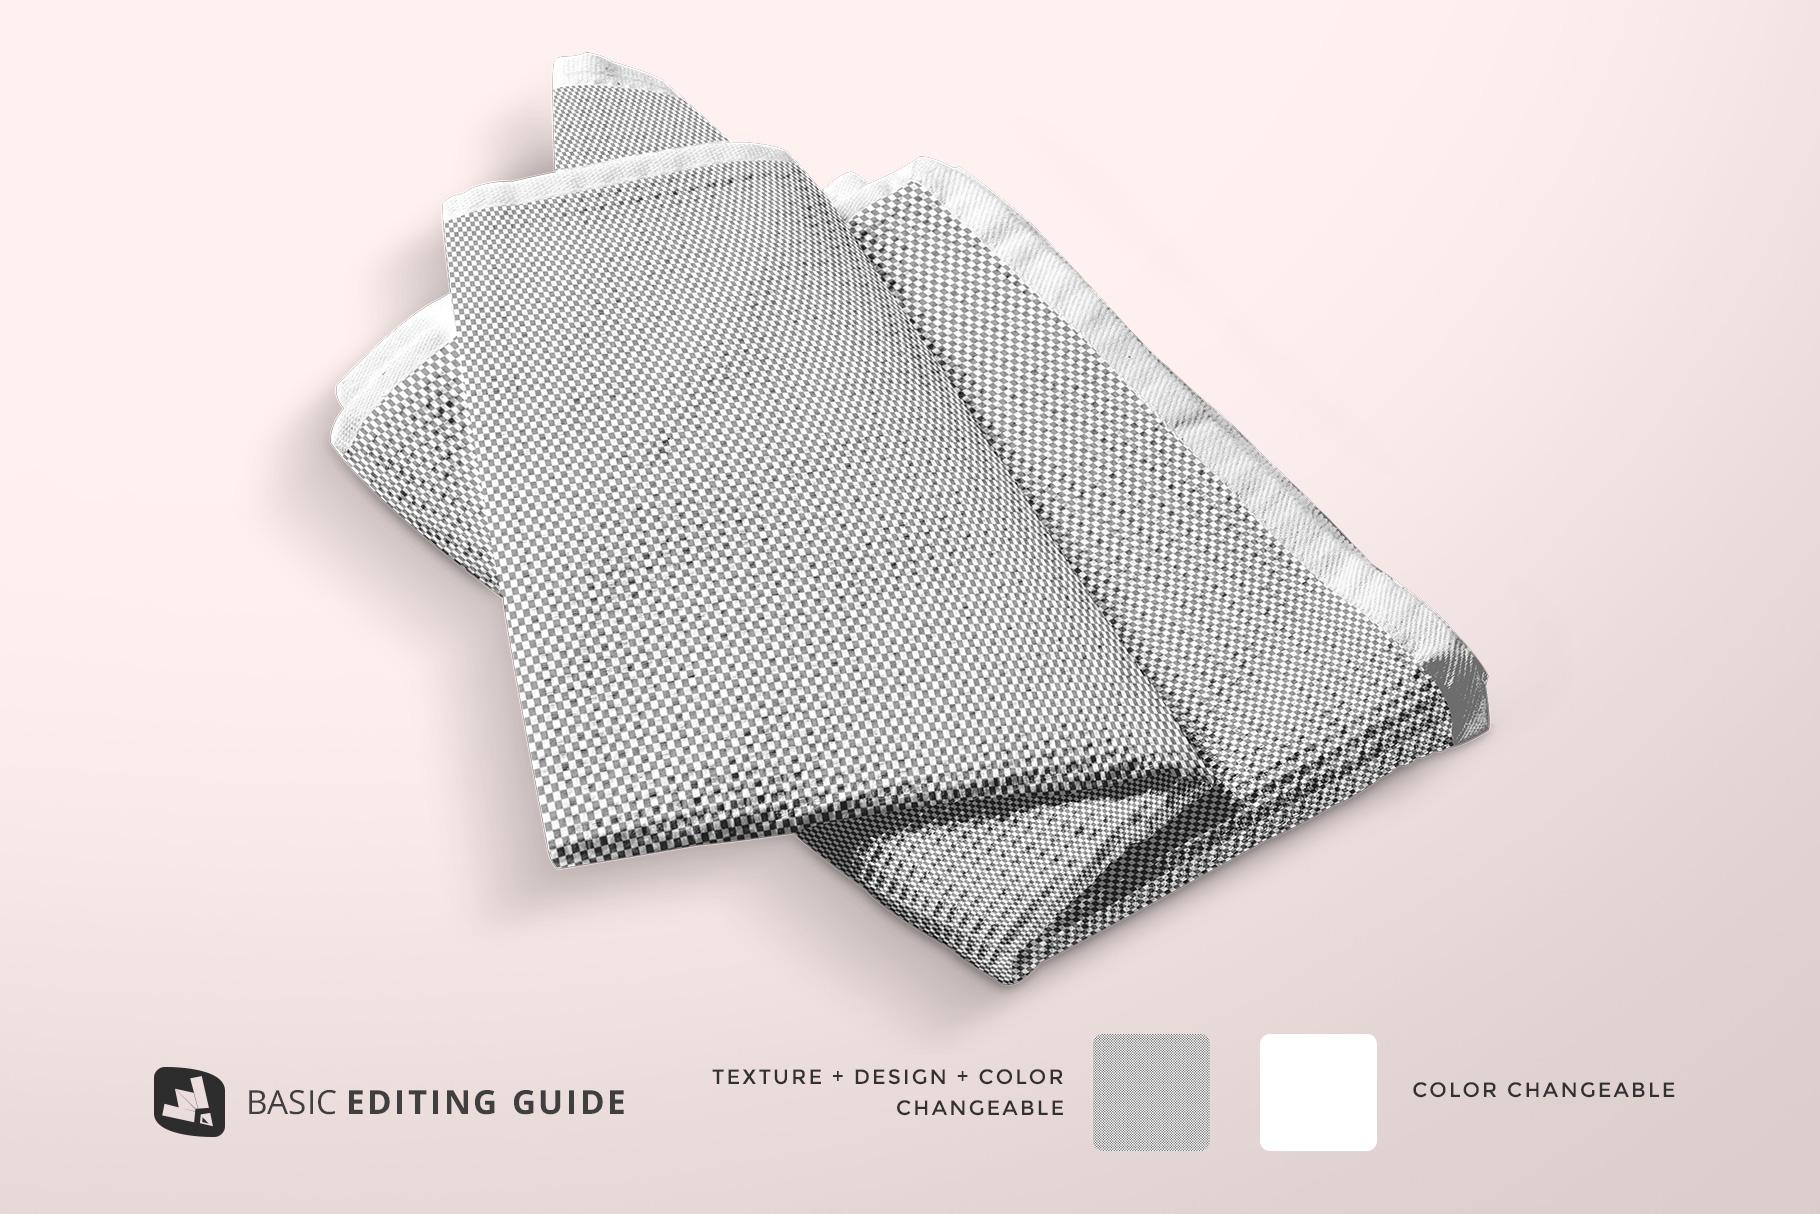 editability of the kitchen washcloth mockup